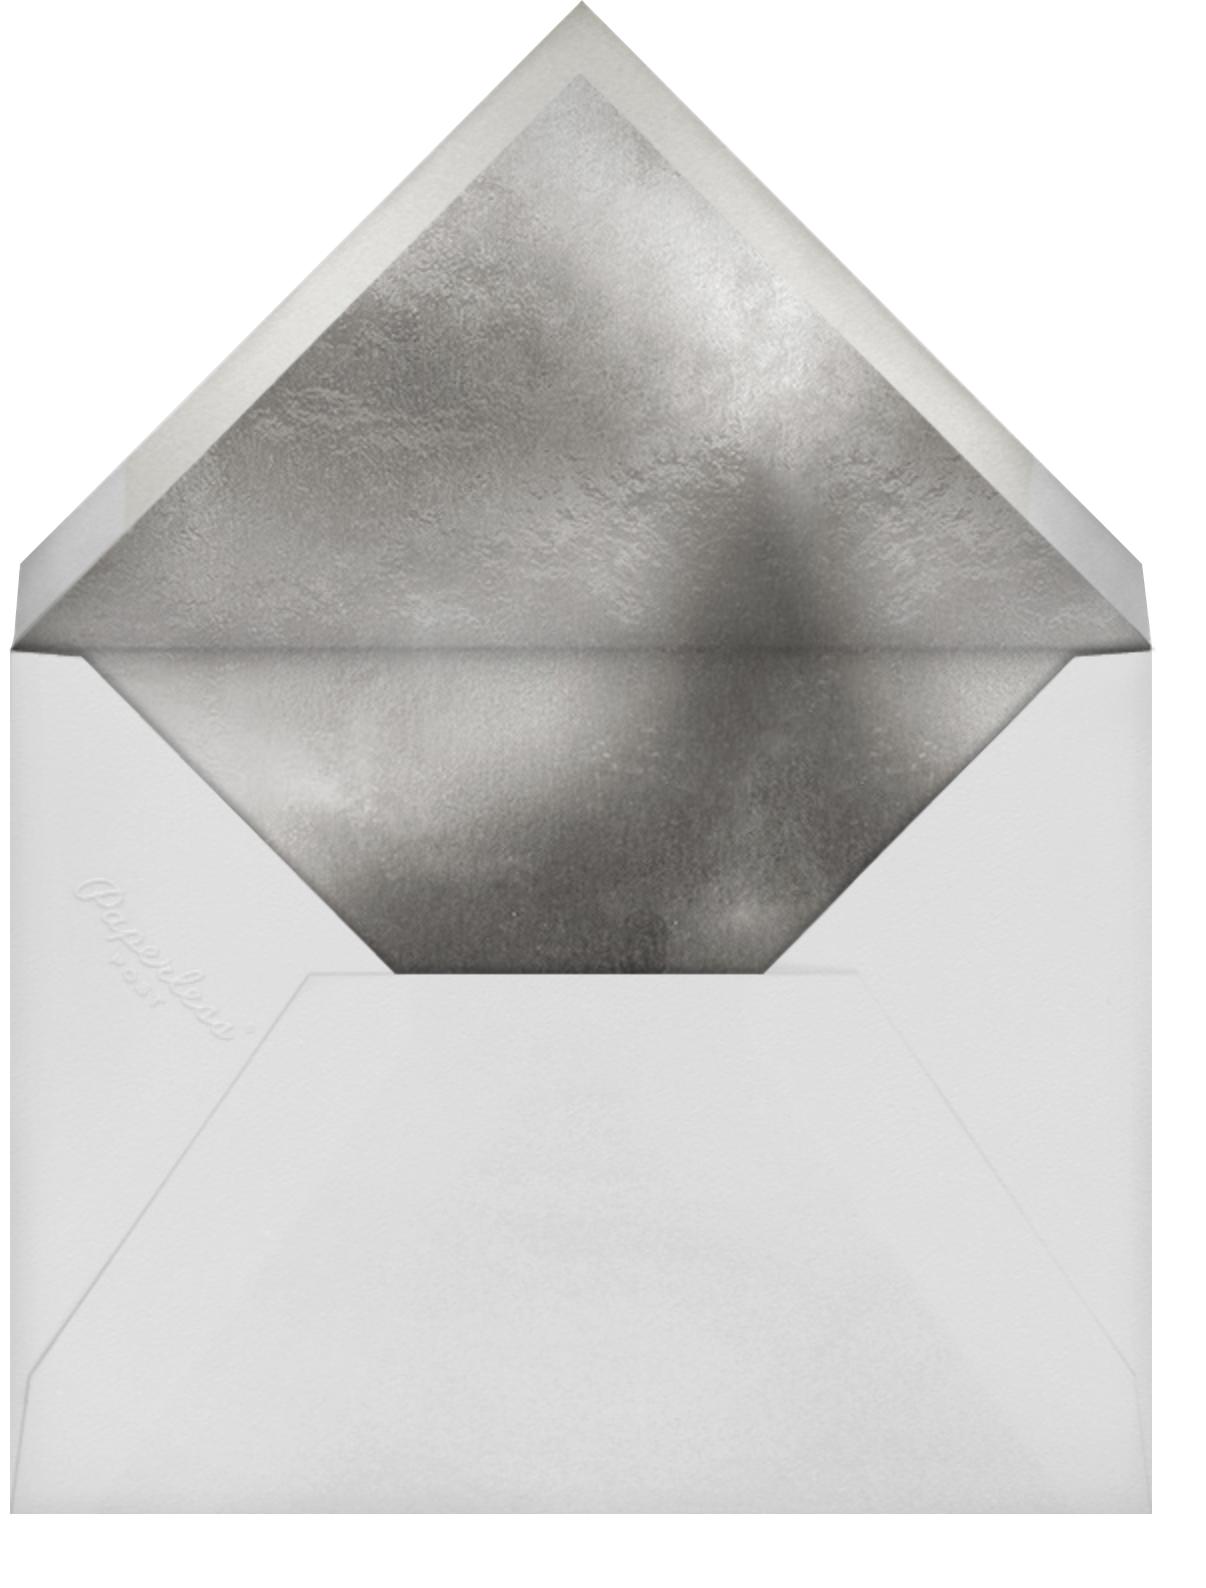 Glam Croc - Silver - kate spade new york - Adult birthday - envelope back